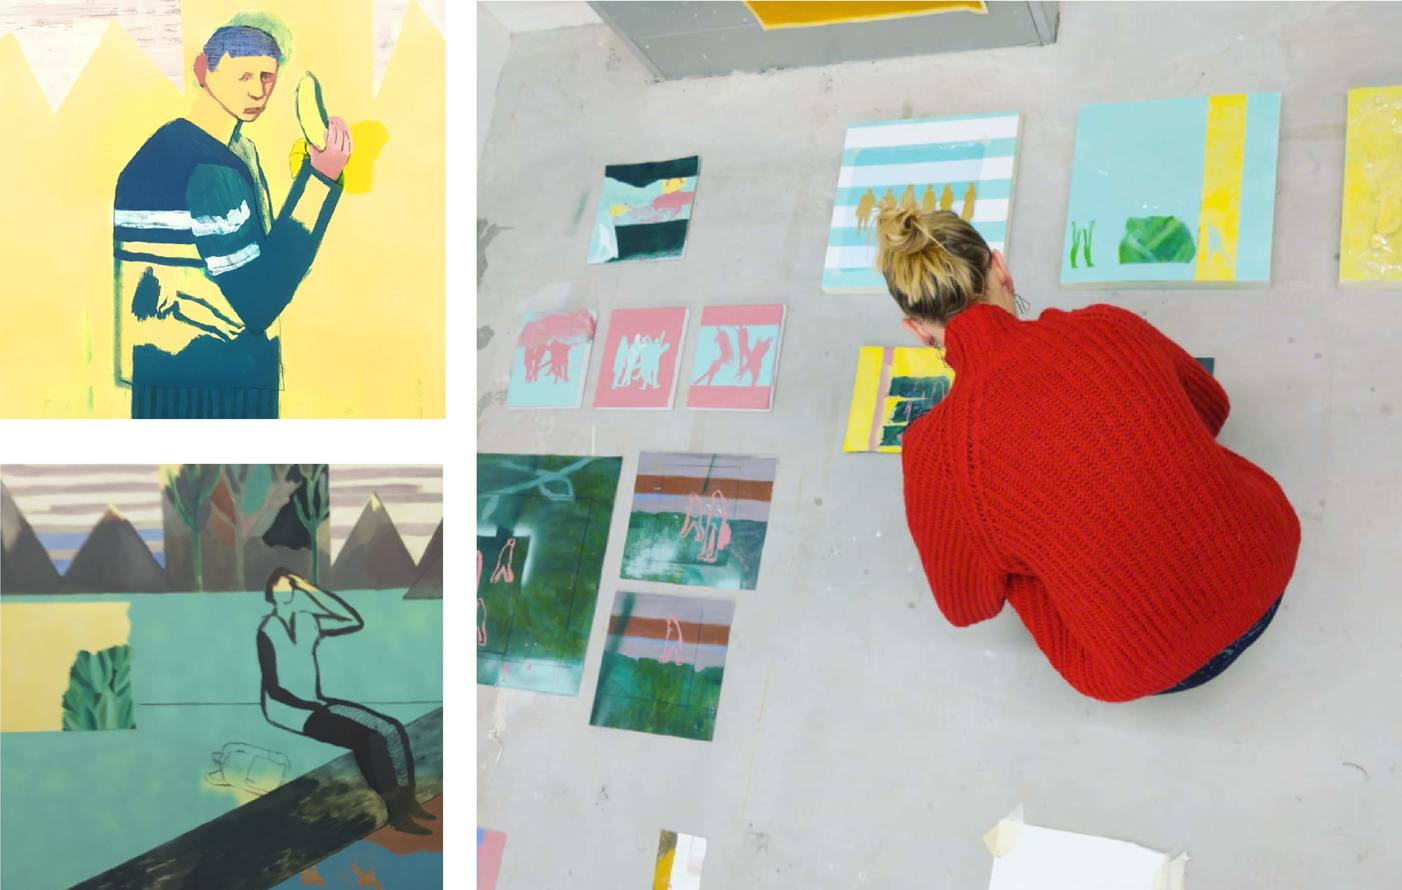 Artist-Residency-Berlin-coGalleries-Studio-Artwork-Diana-Zrnic